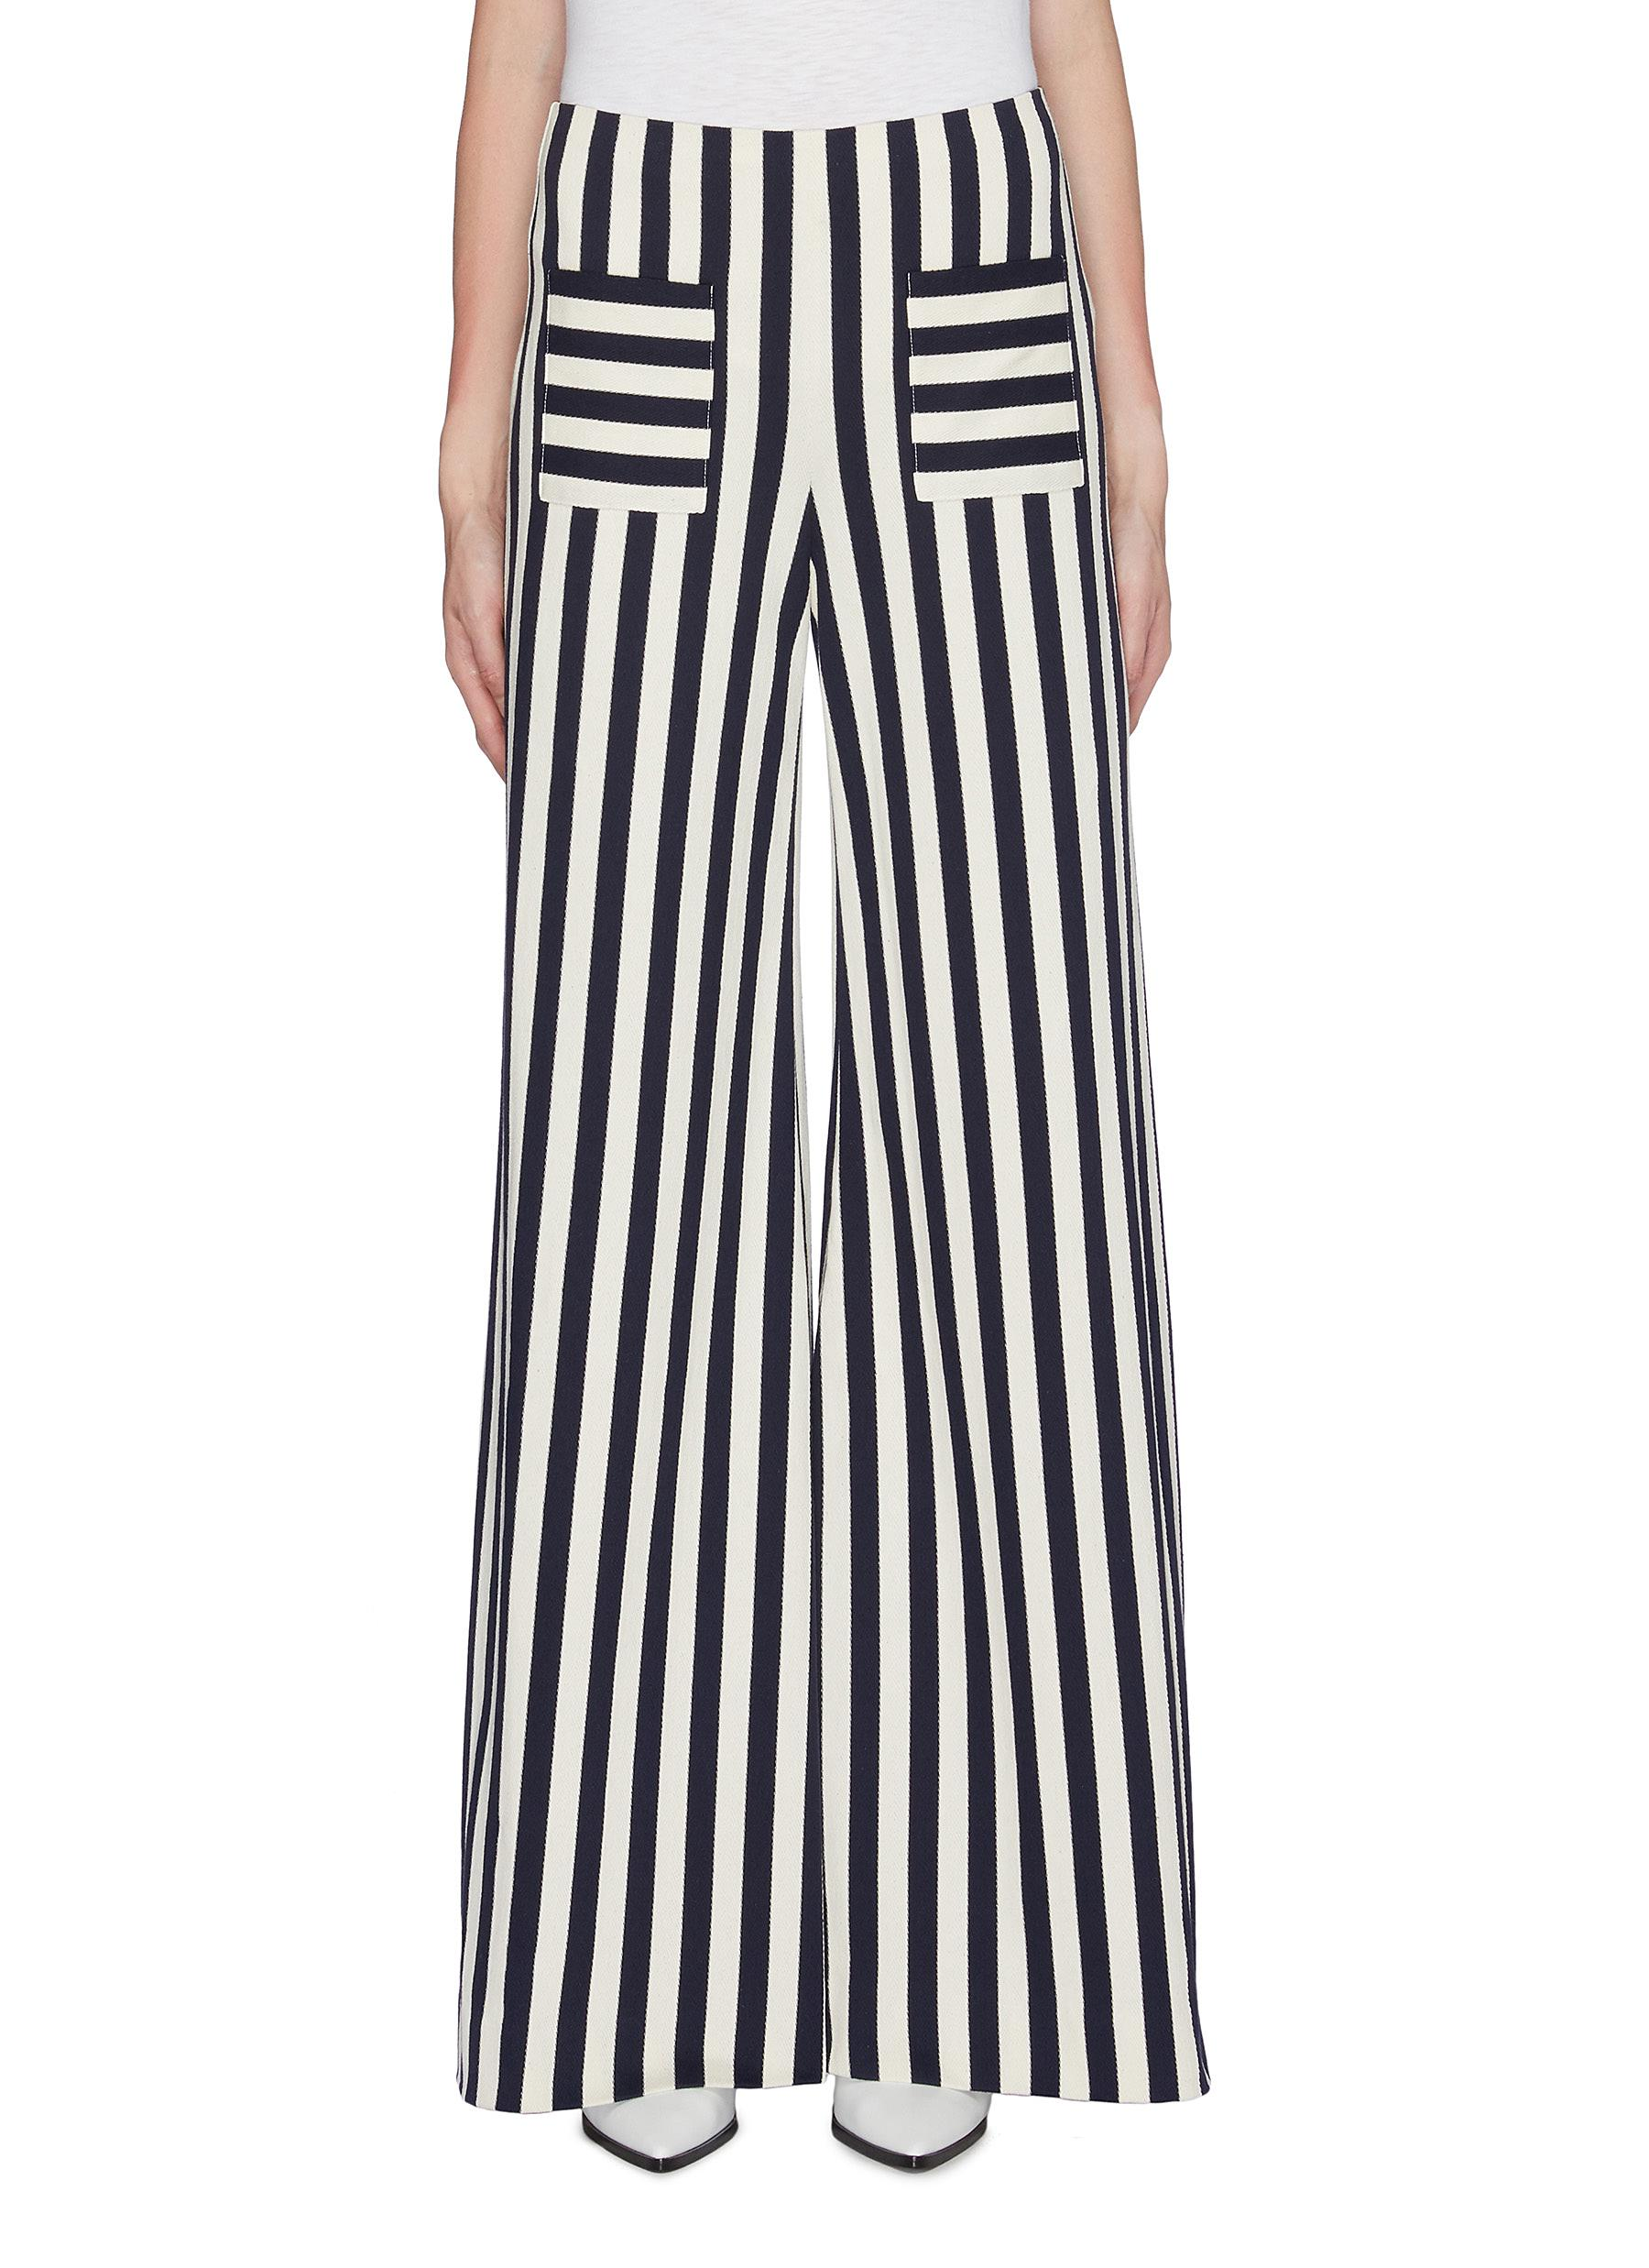 Luc patch pocket stripe twill herringbone wide leg pants by Hellessy